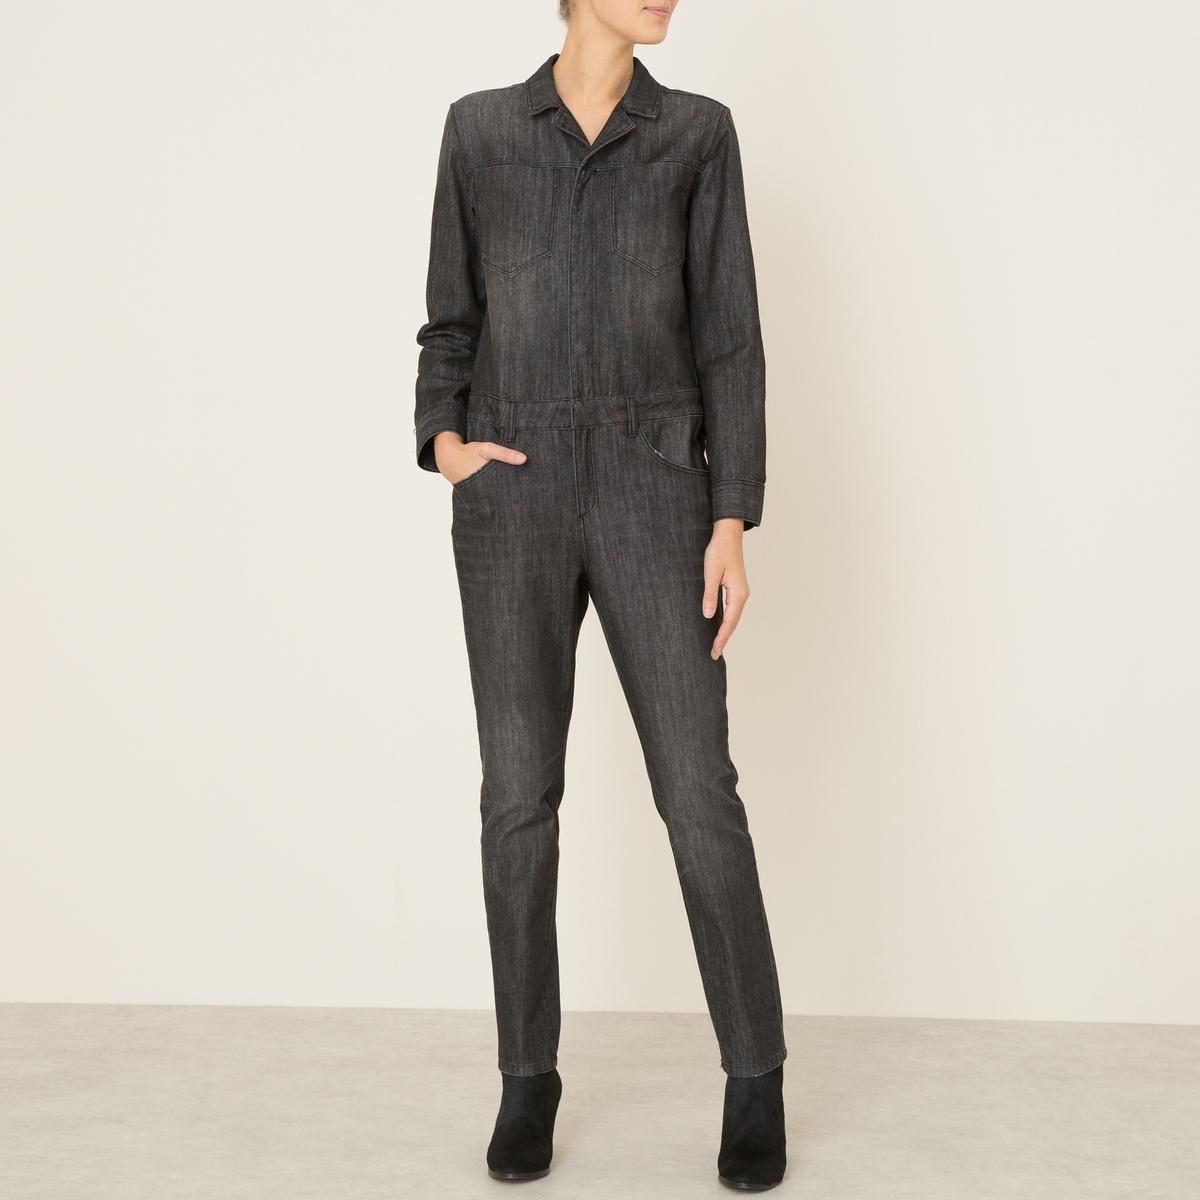 Комбинезон с брюками из денима MISSOURI от La Redoute